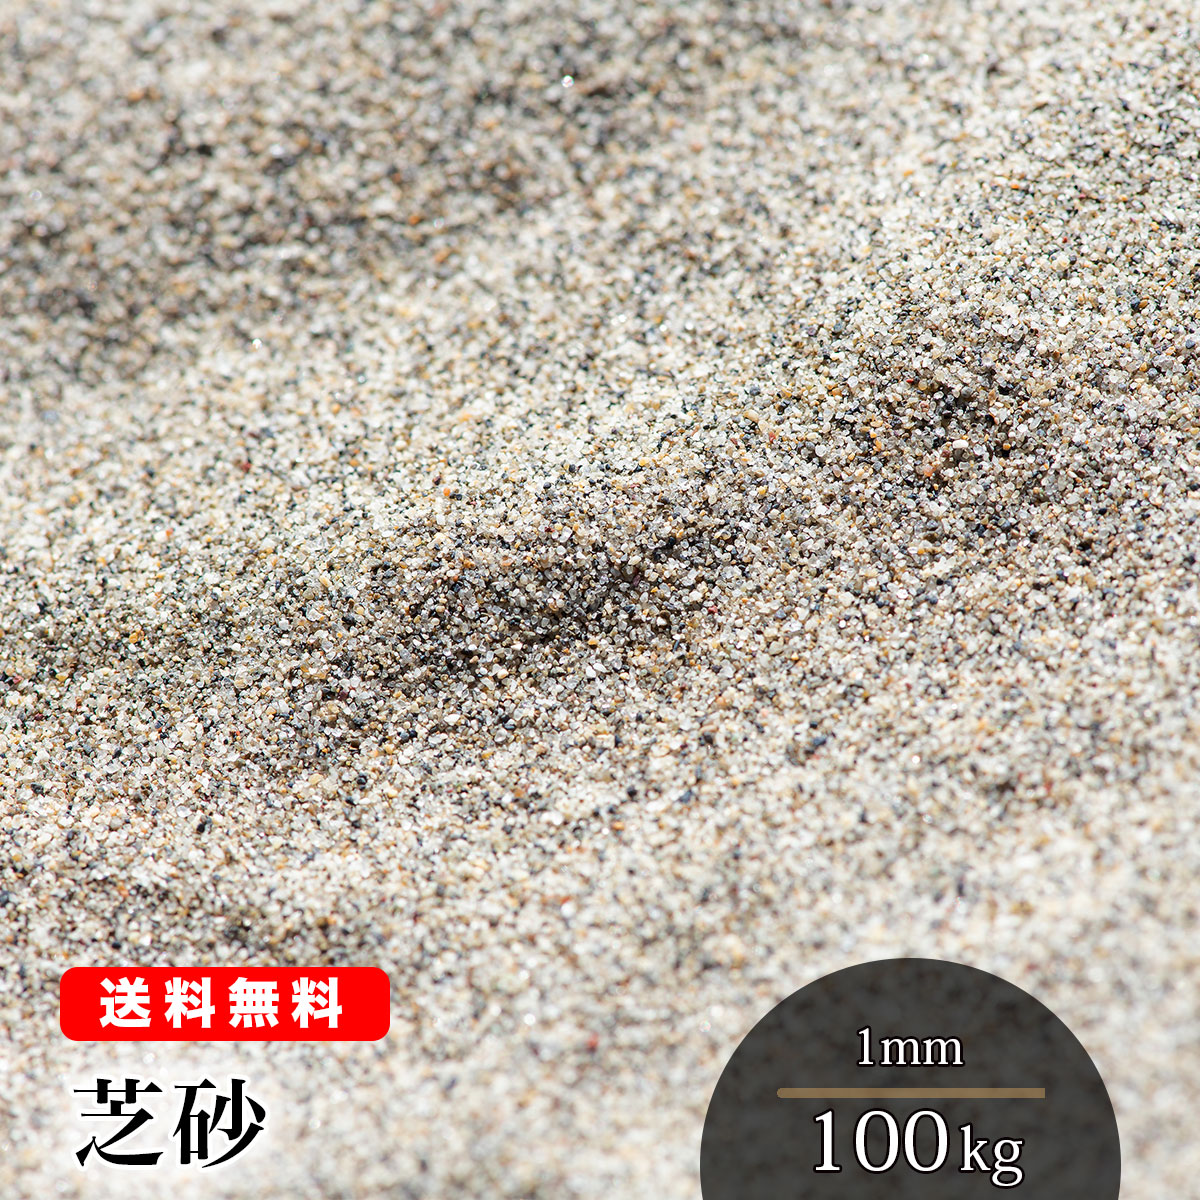 【送料無料】100kg 芝砂 1mm(20kg×5)芝生用 目砂 乾燥砂 芝生育成 芝生養生 国産 芝生の砂 芝生の砂 芝土 目土 園芸 造園 ガーデニング 山砂 静岡県産